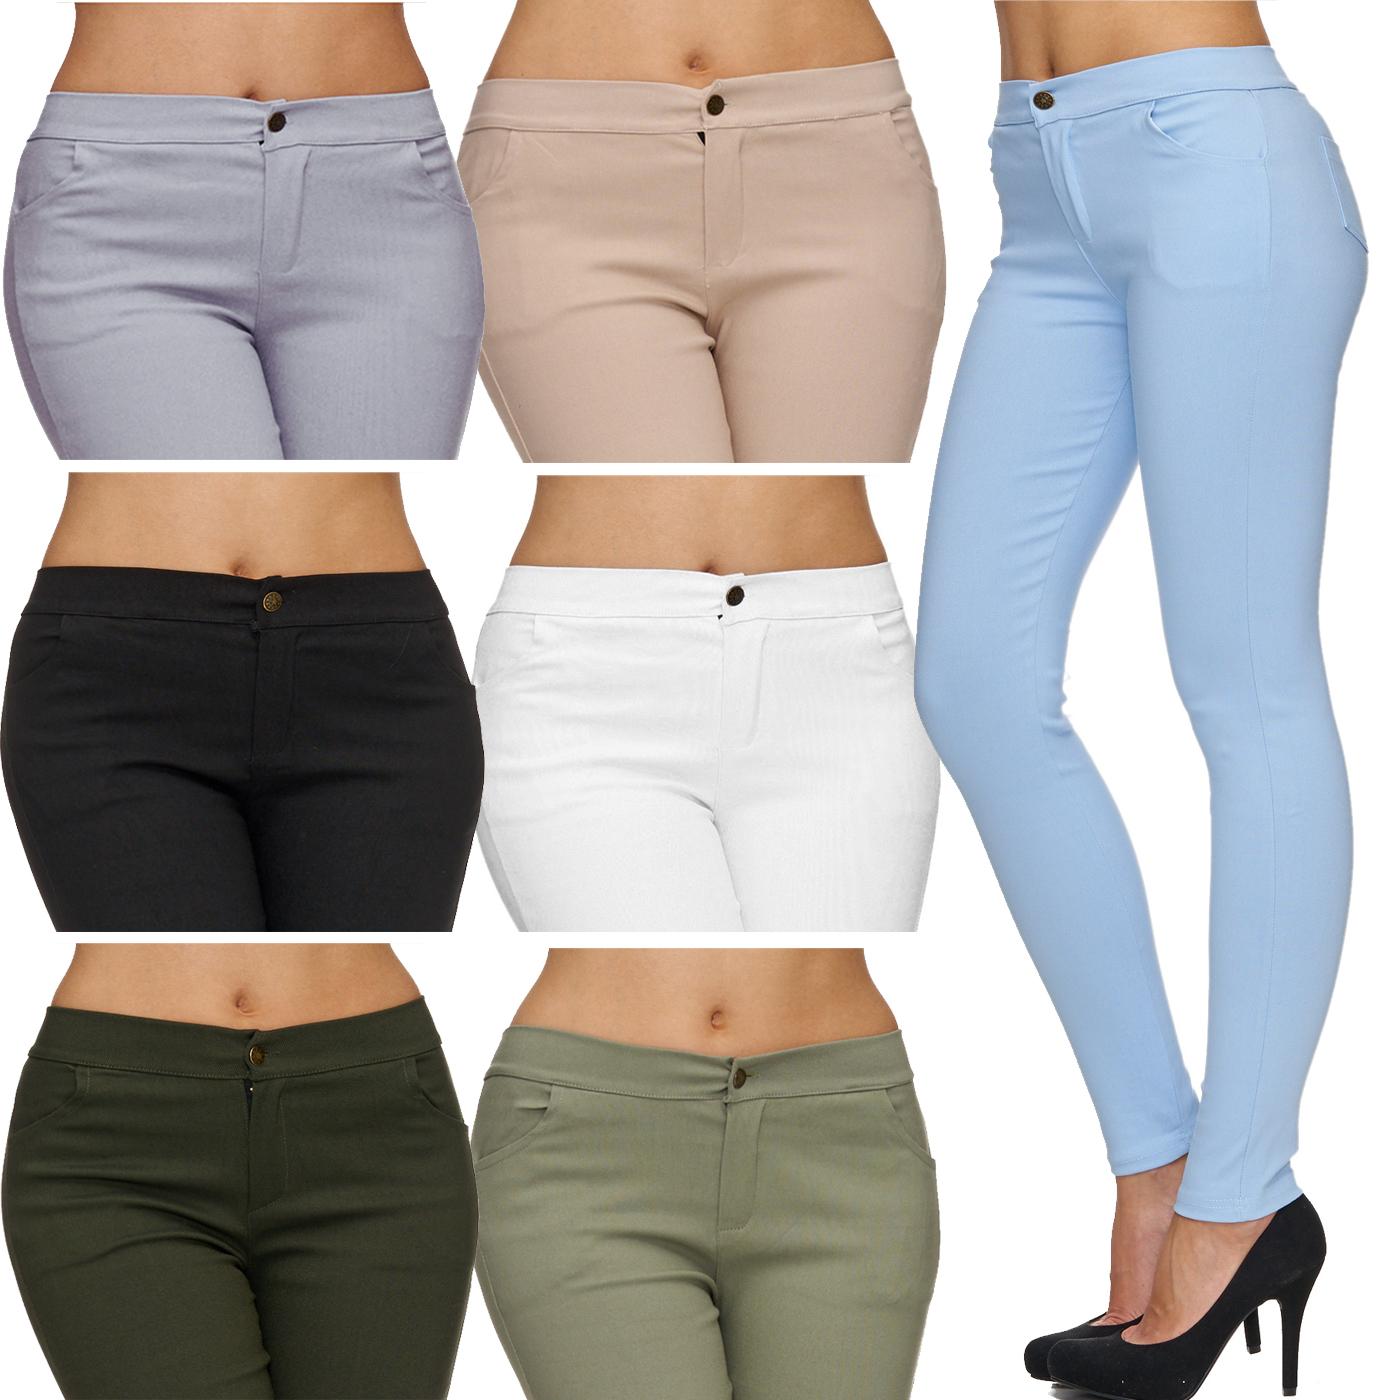 Damen Jeans Hose Legging Röhrenjeans Skinny Stretch Denim hoher Bund Tregging